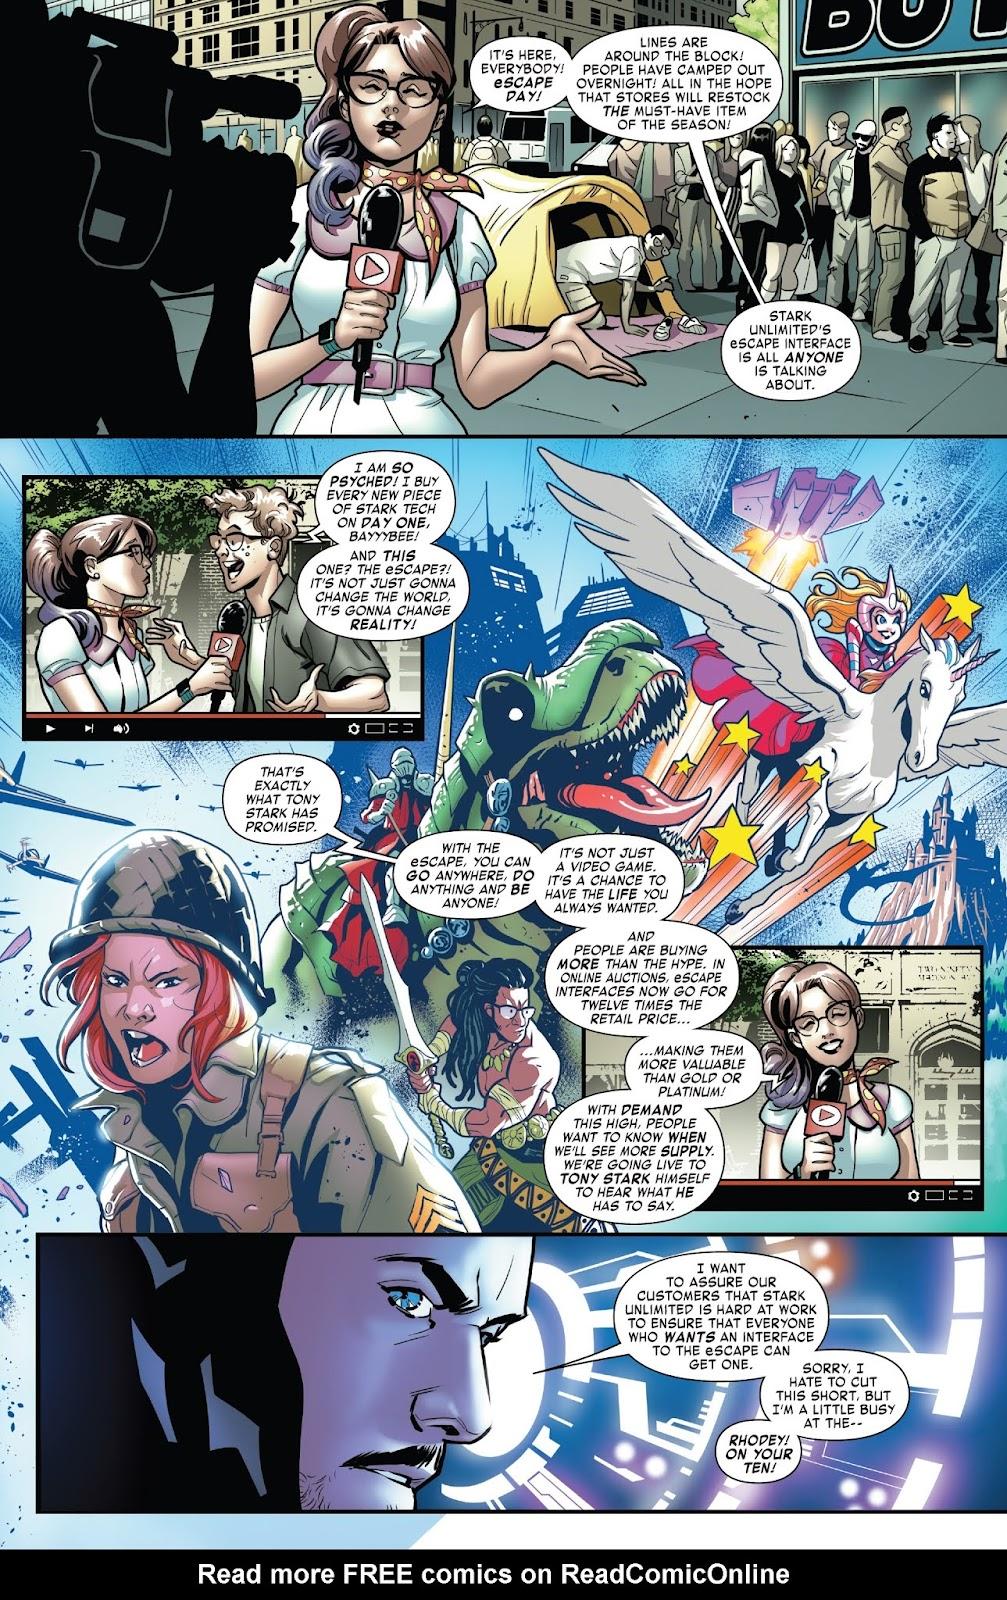 Read online Tony Stark: Iron Man comic -  Issue #6 - 4